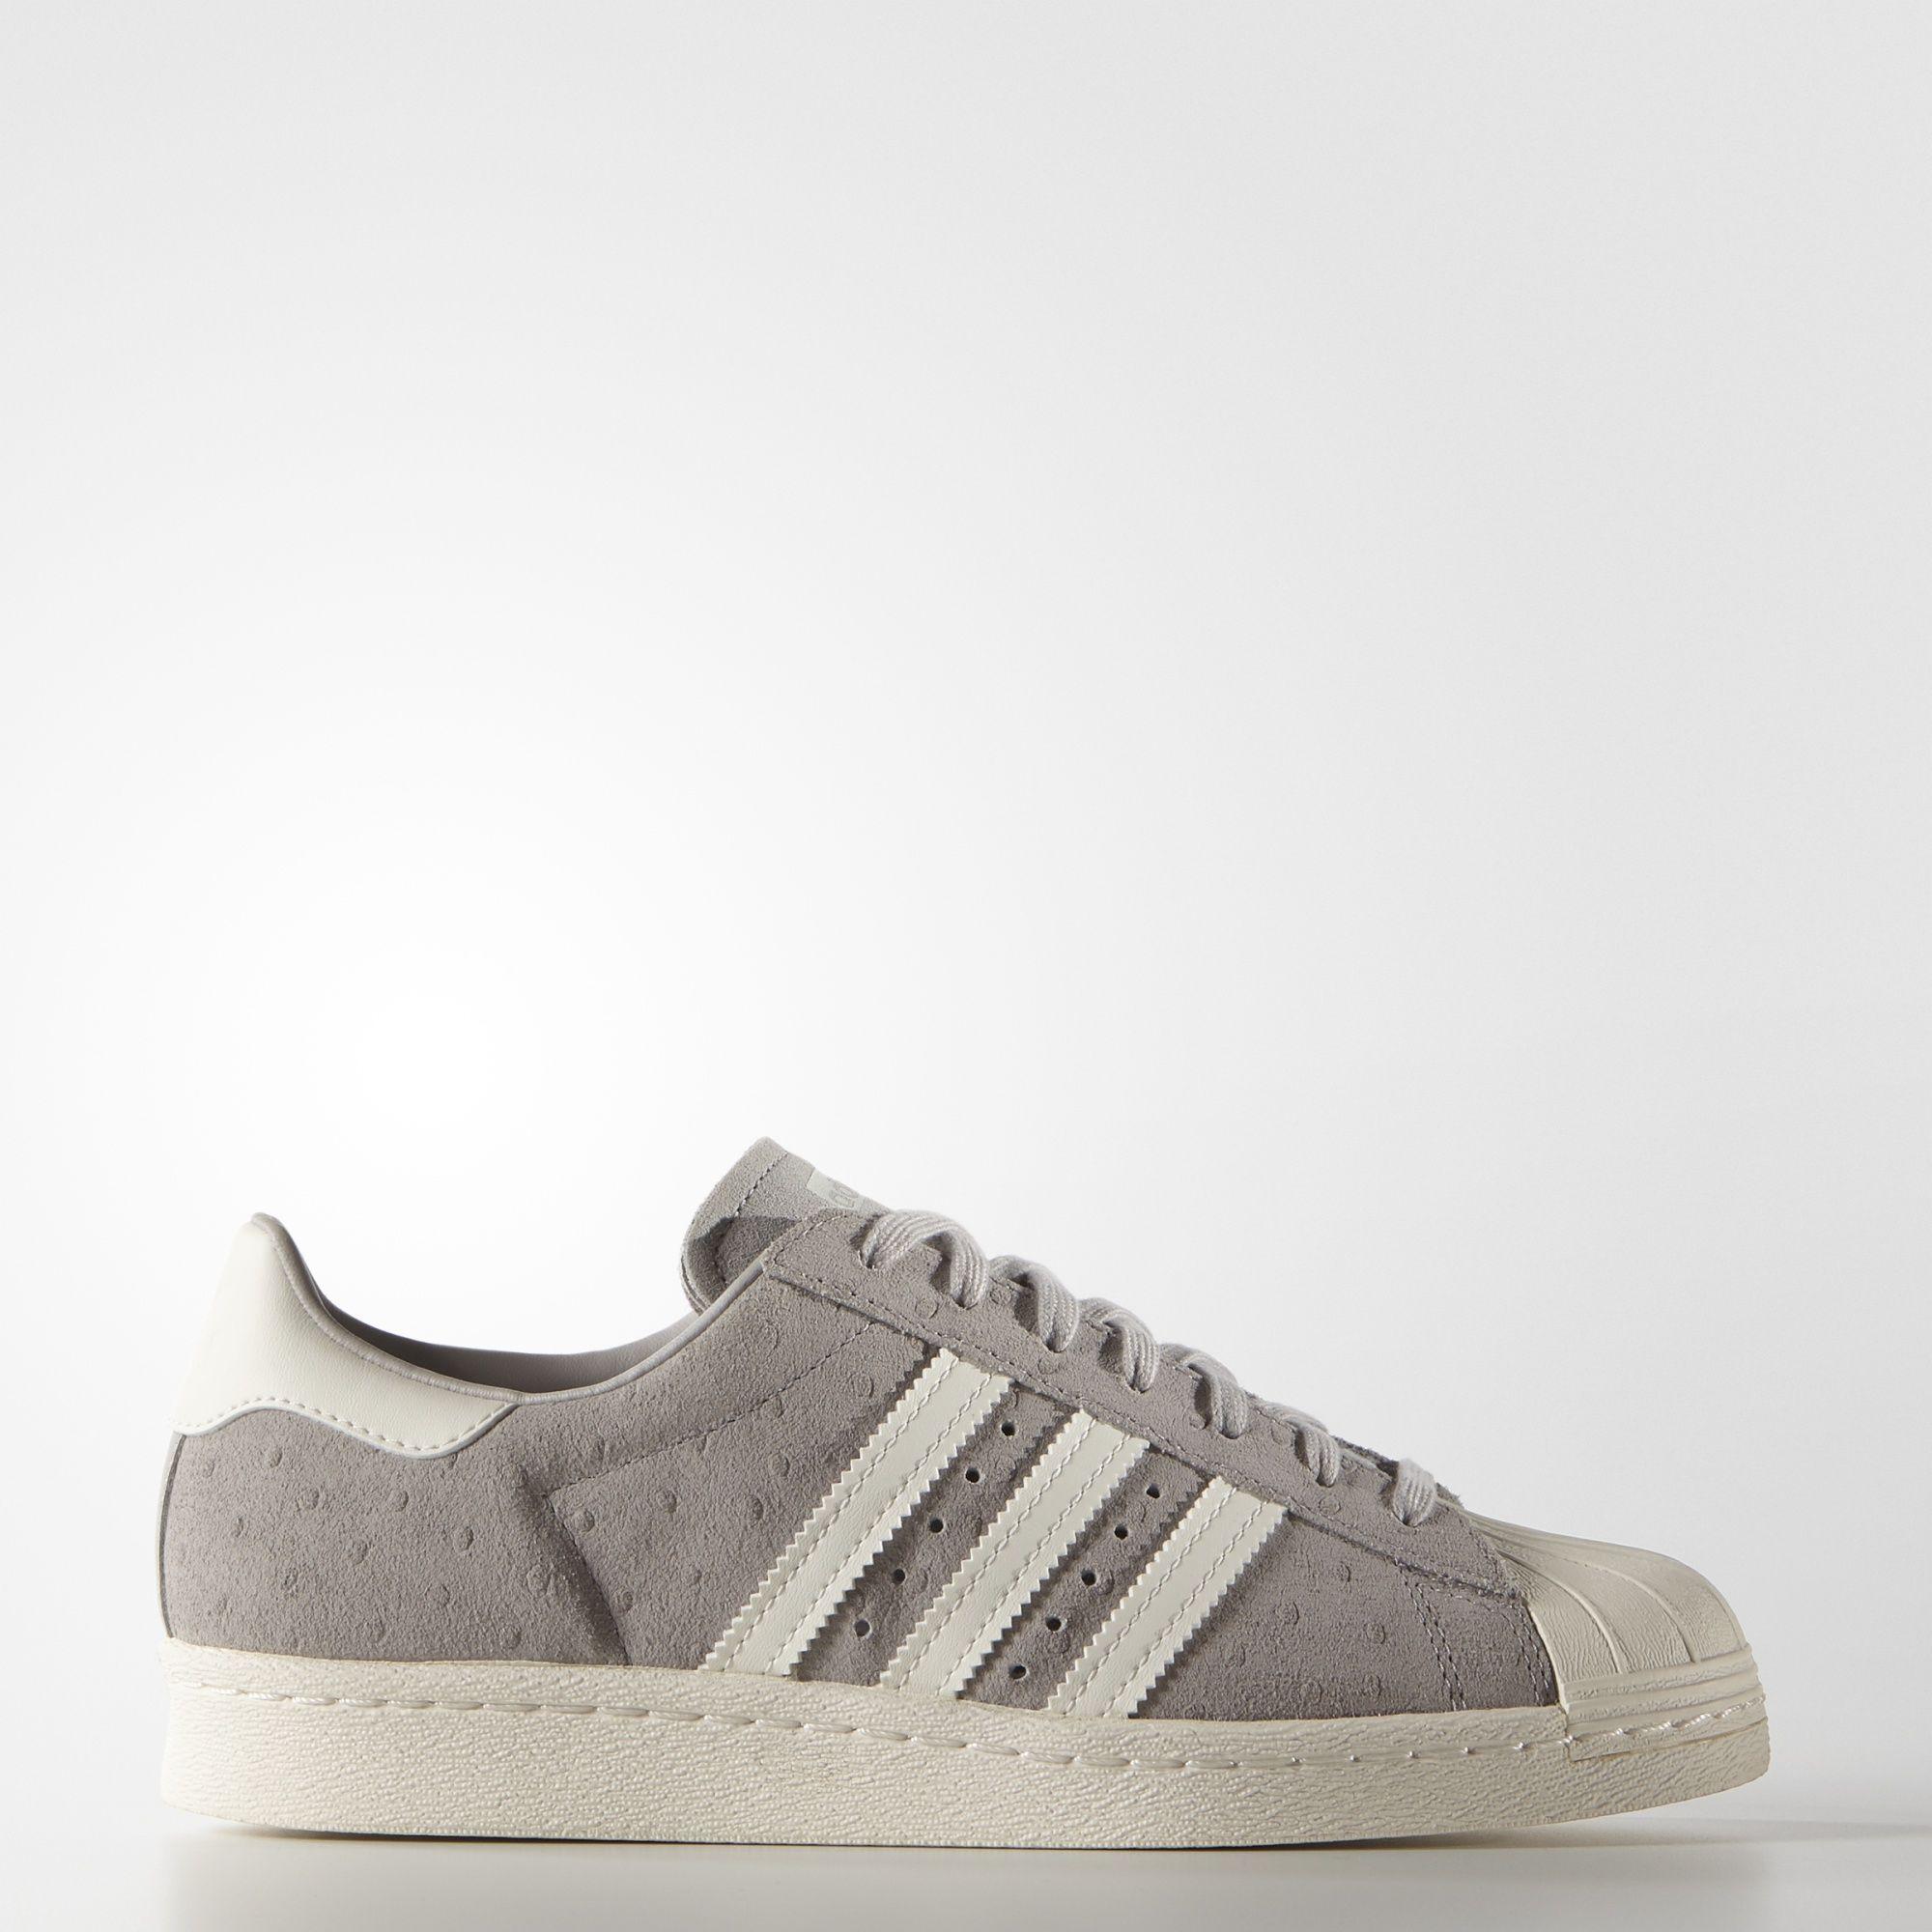 chaussures adidas superstar 80s